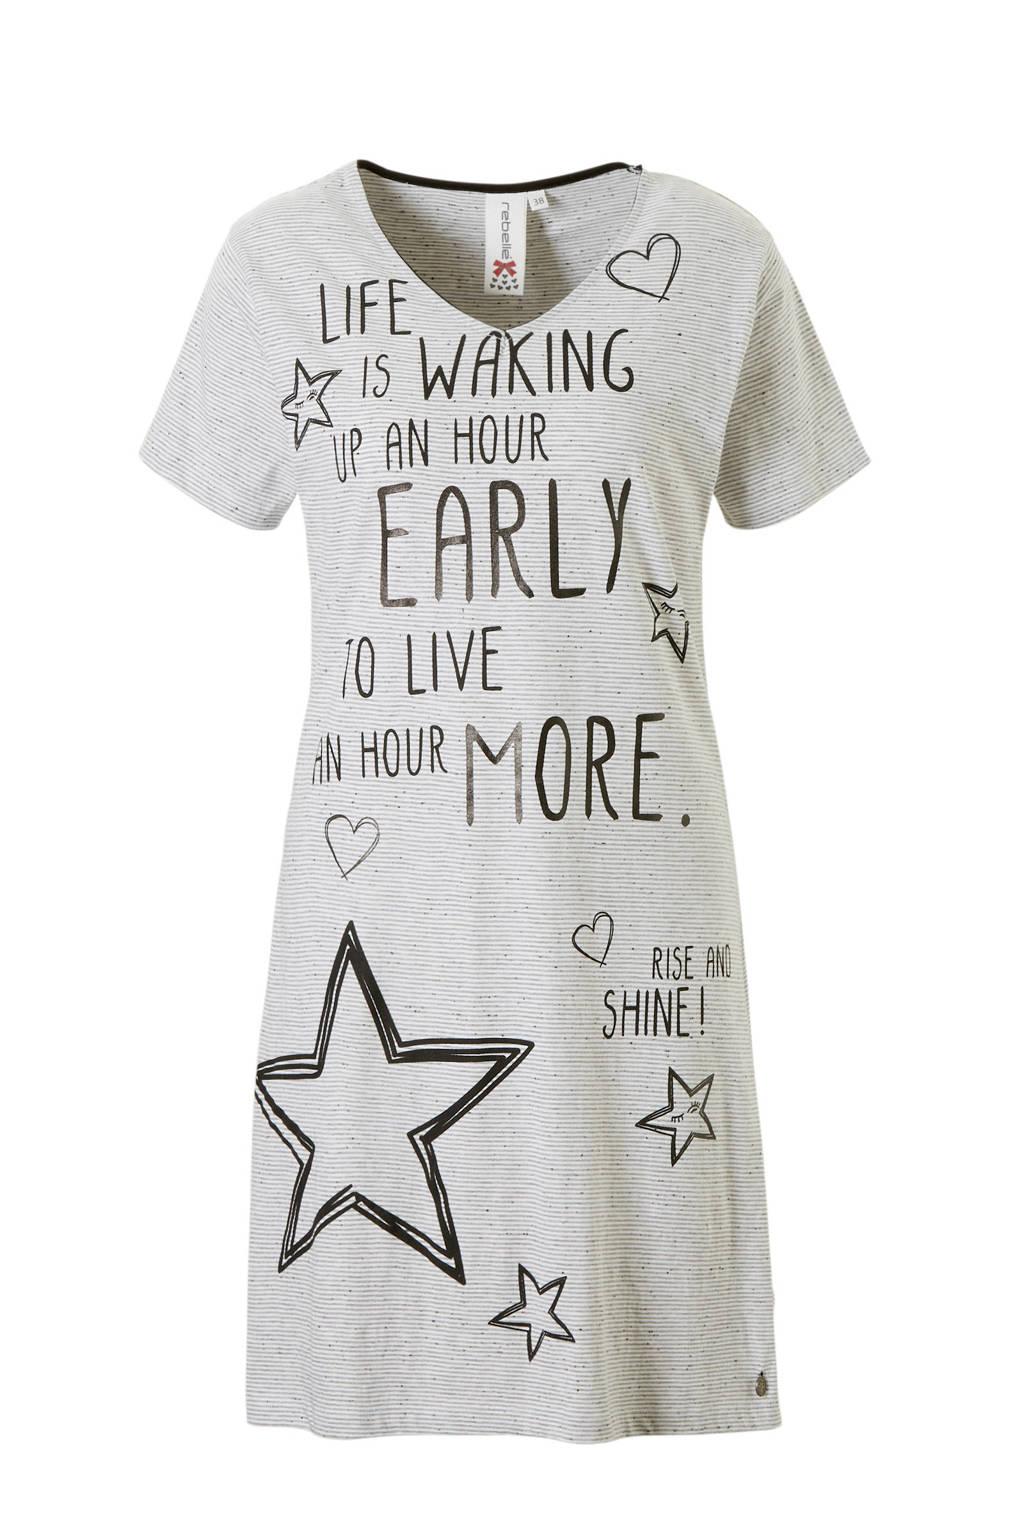 Rebelle nachthemd in all over print grijs, Grijs/zand